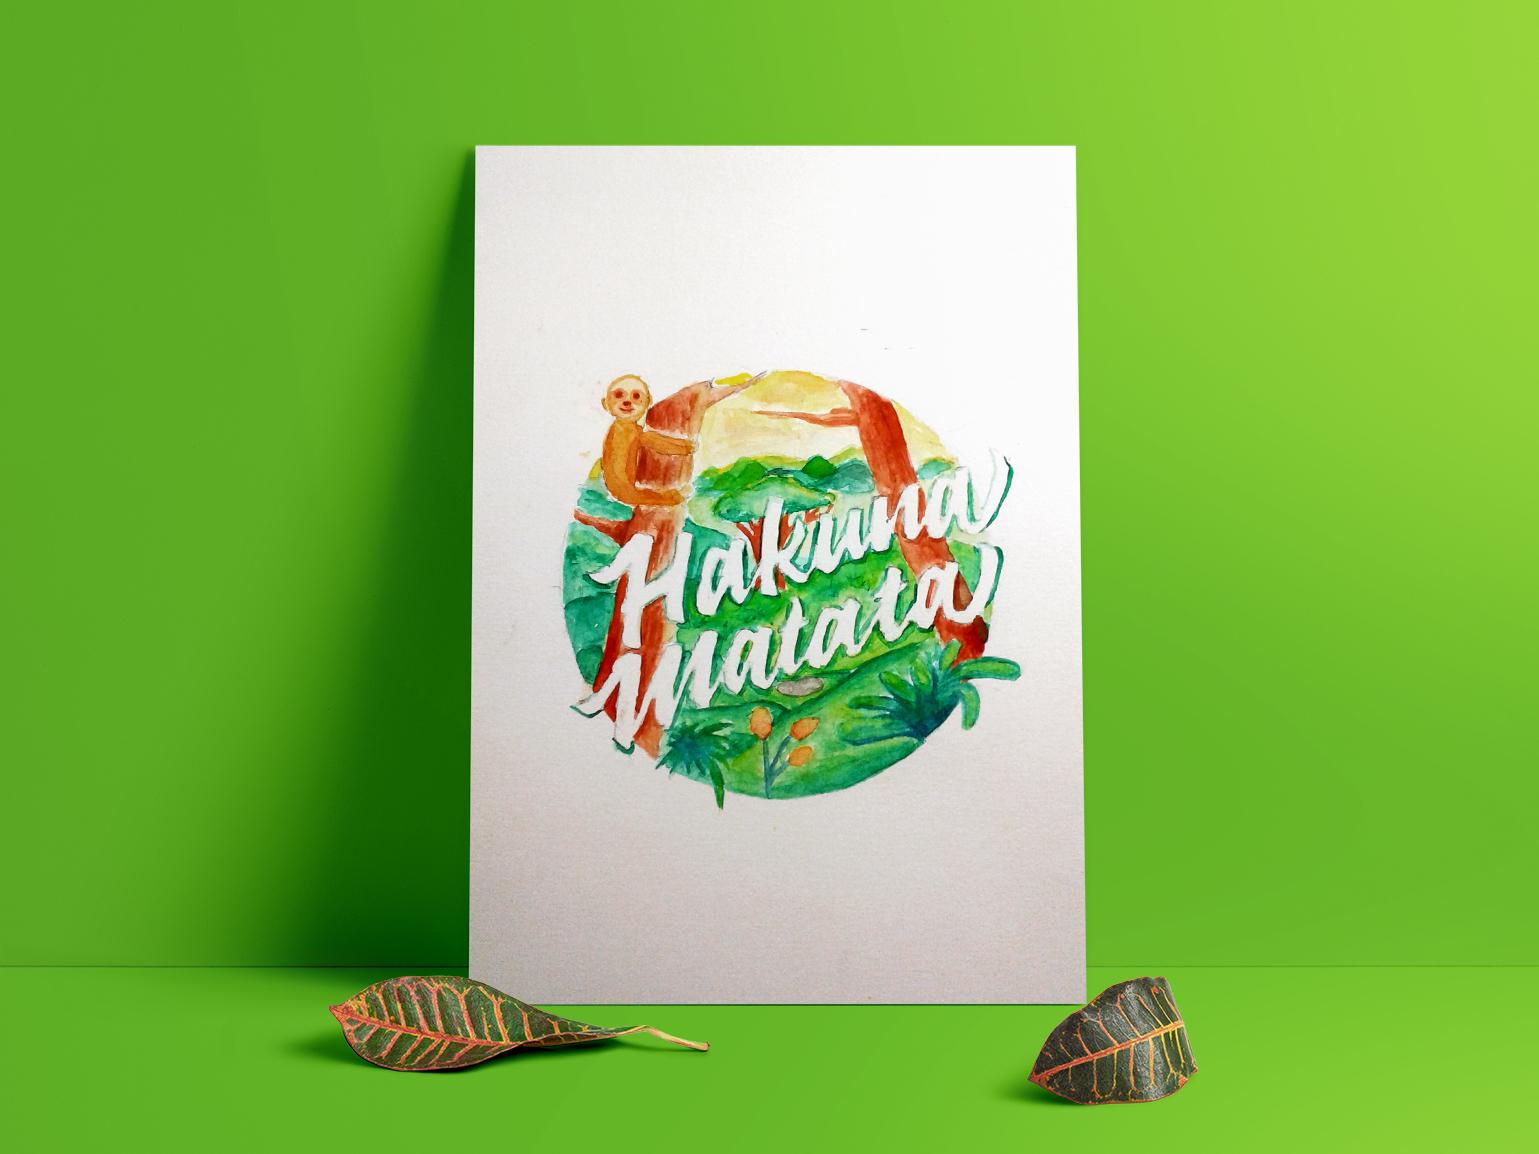 Hakuna Matata hakuna matata peace jungle letters lettering digital 2d art photoshop art watercolour vector style design illustration